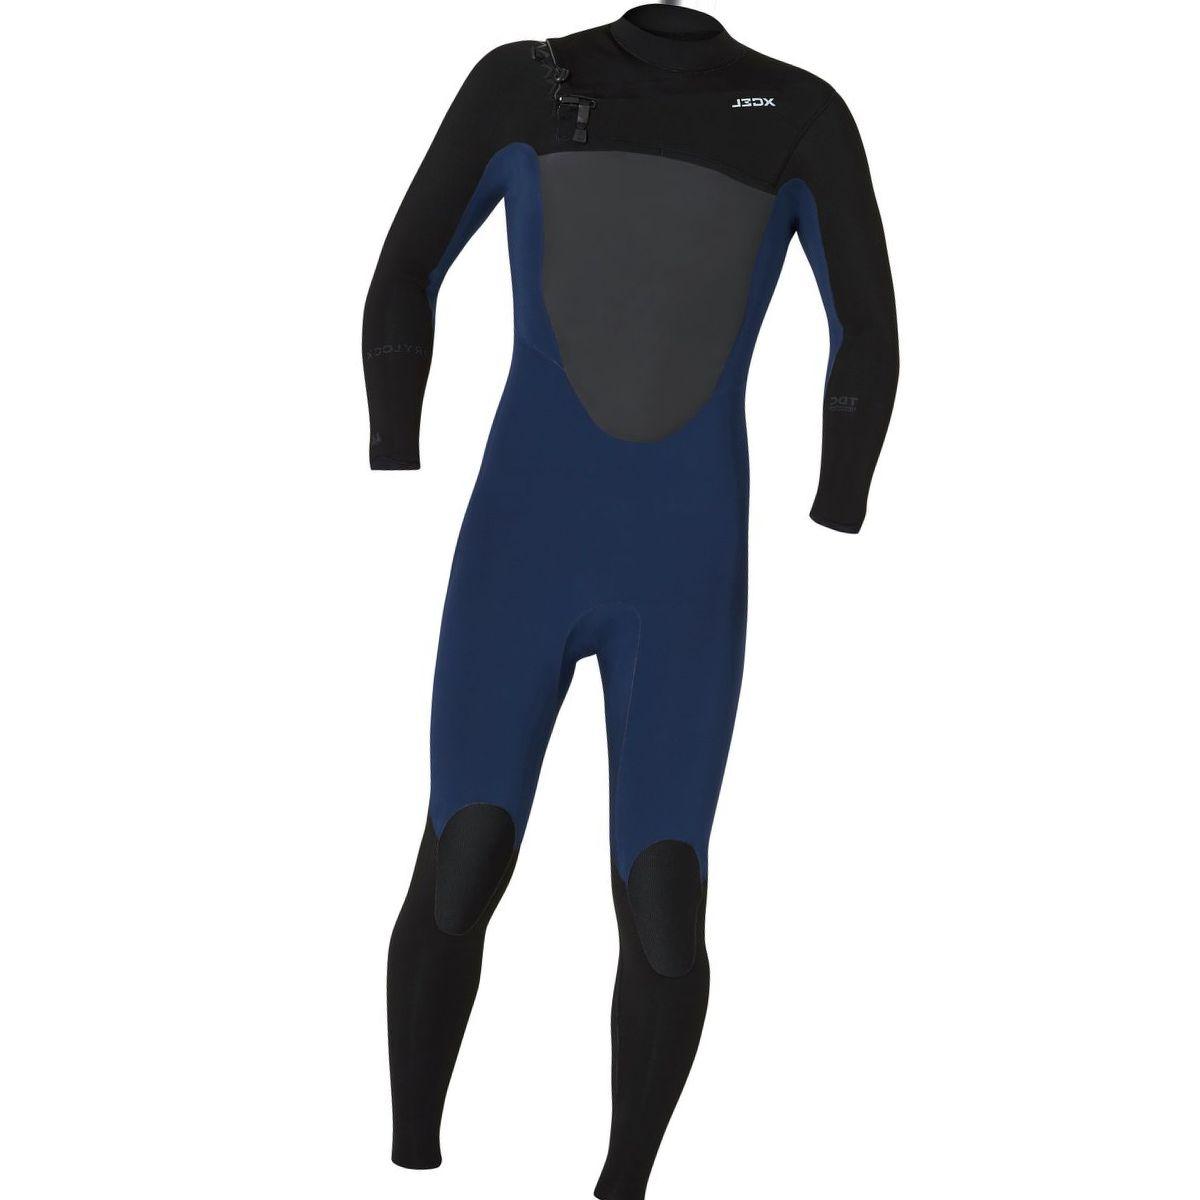 XCEL Drylock 3/2mm TDC Full Wetsuit - Men's